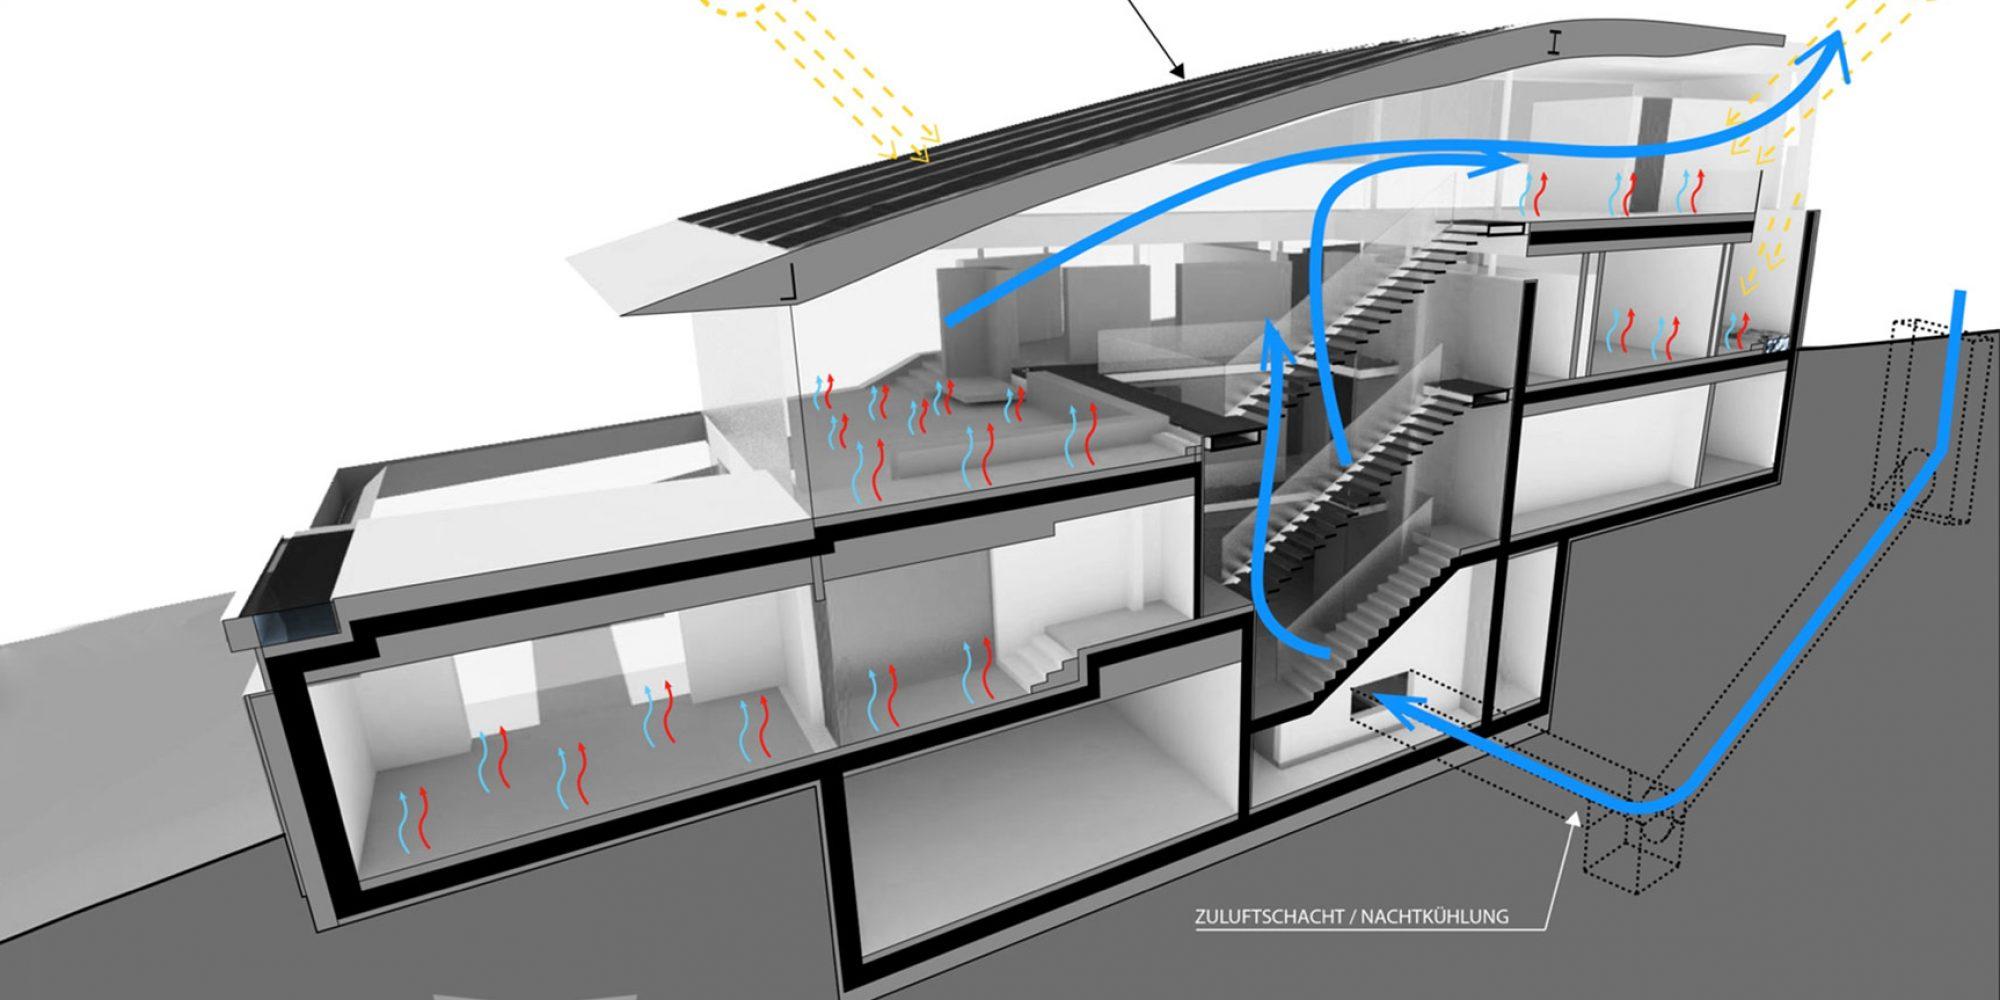 11 Haus P Najjar Studios Architects Vienna Austria Beirut Lebanon (1) copy